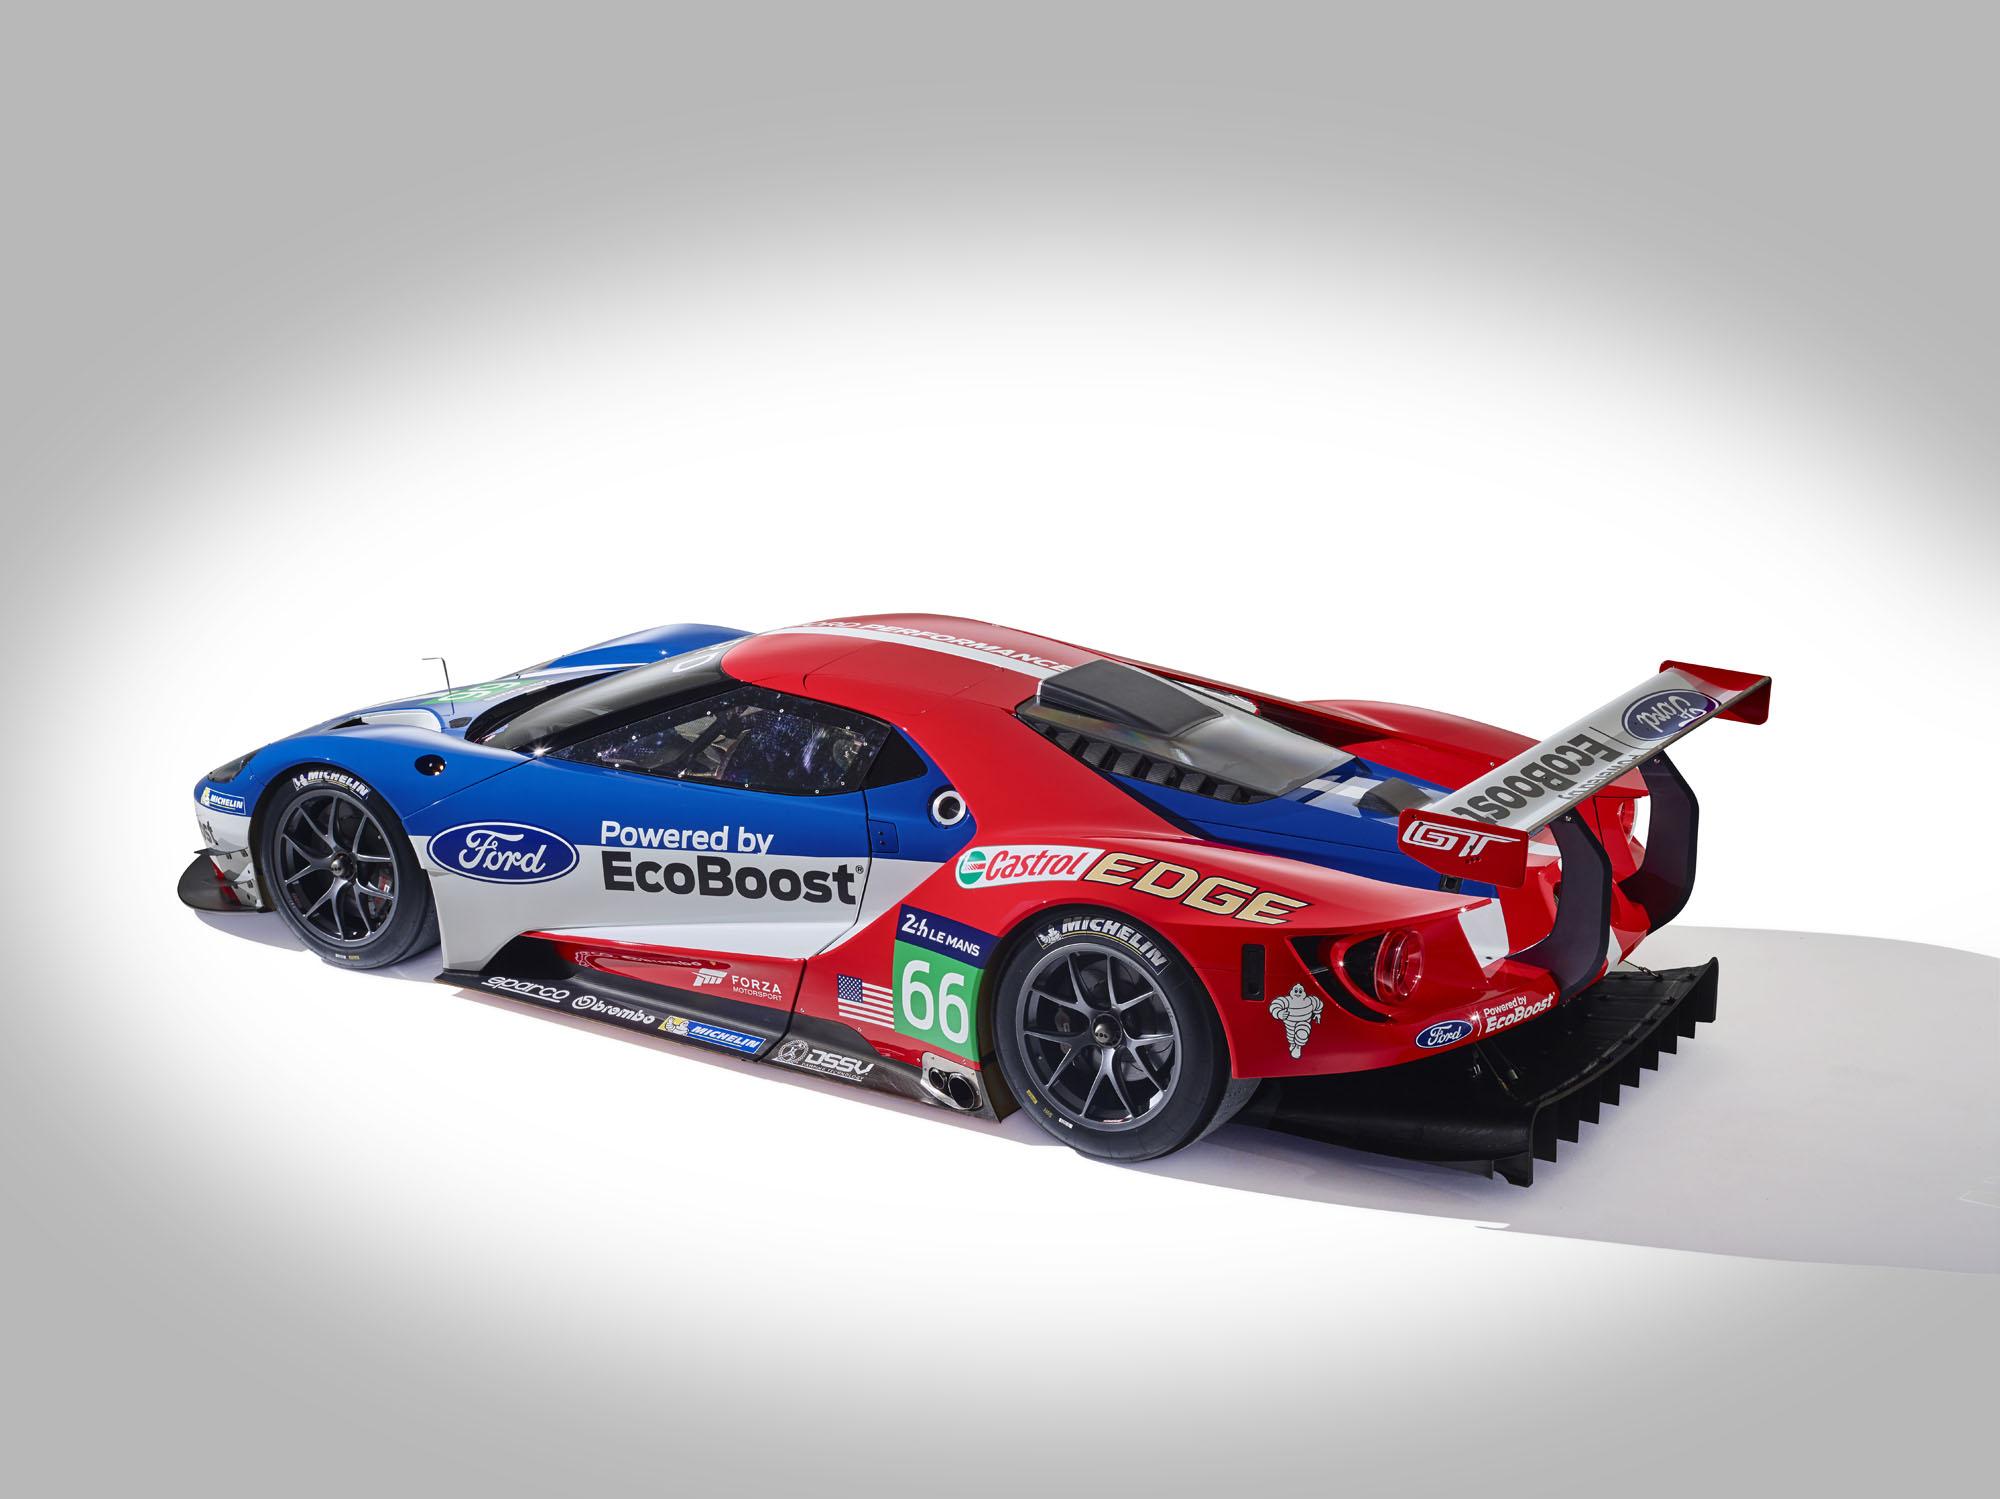 2016-ford-gt-lemans-racecar-03.jpg